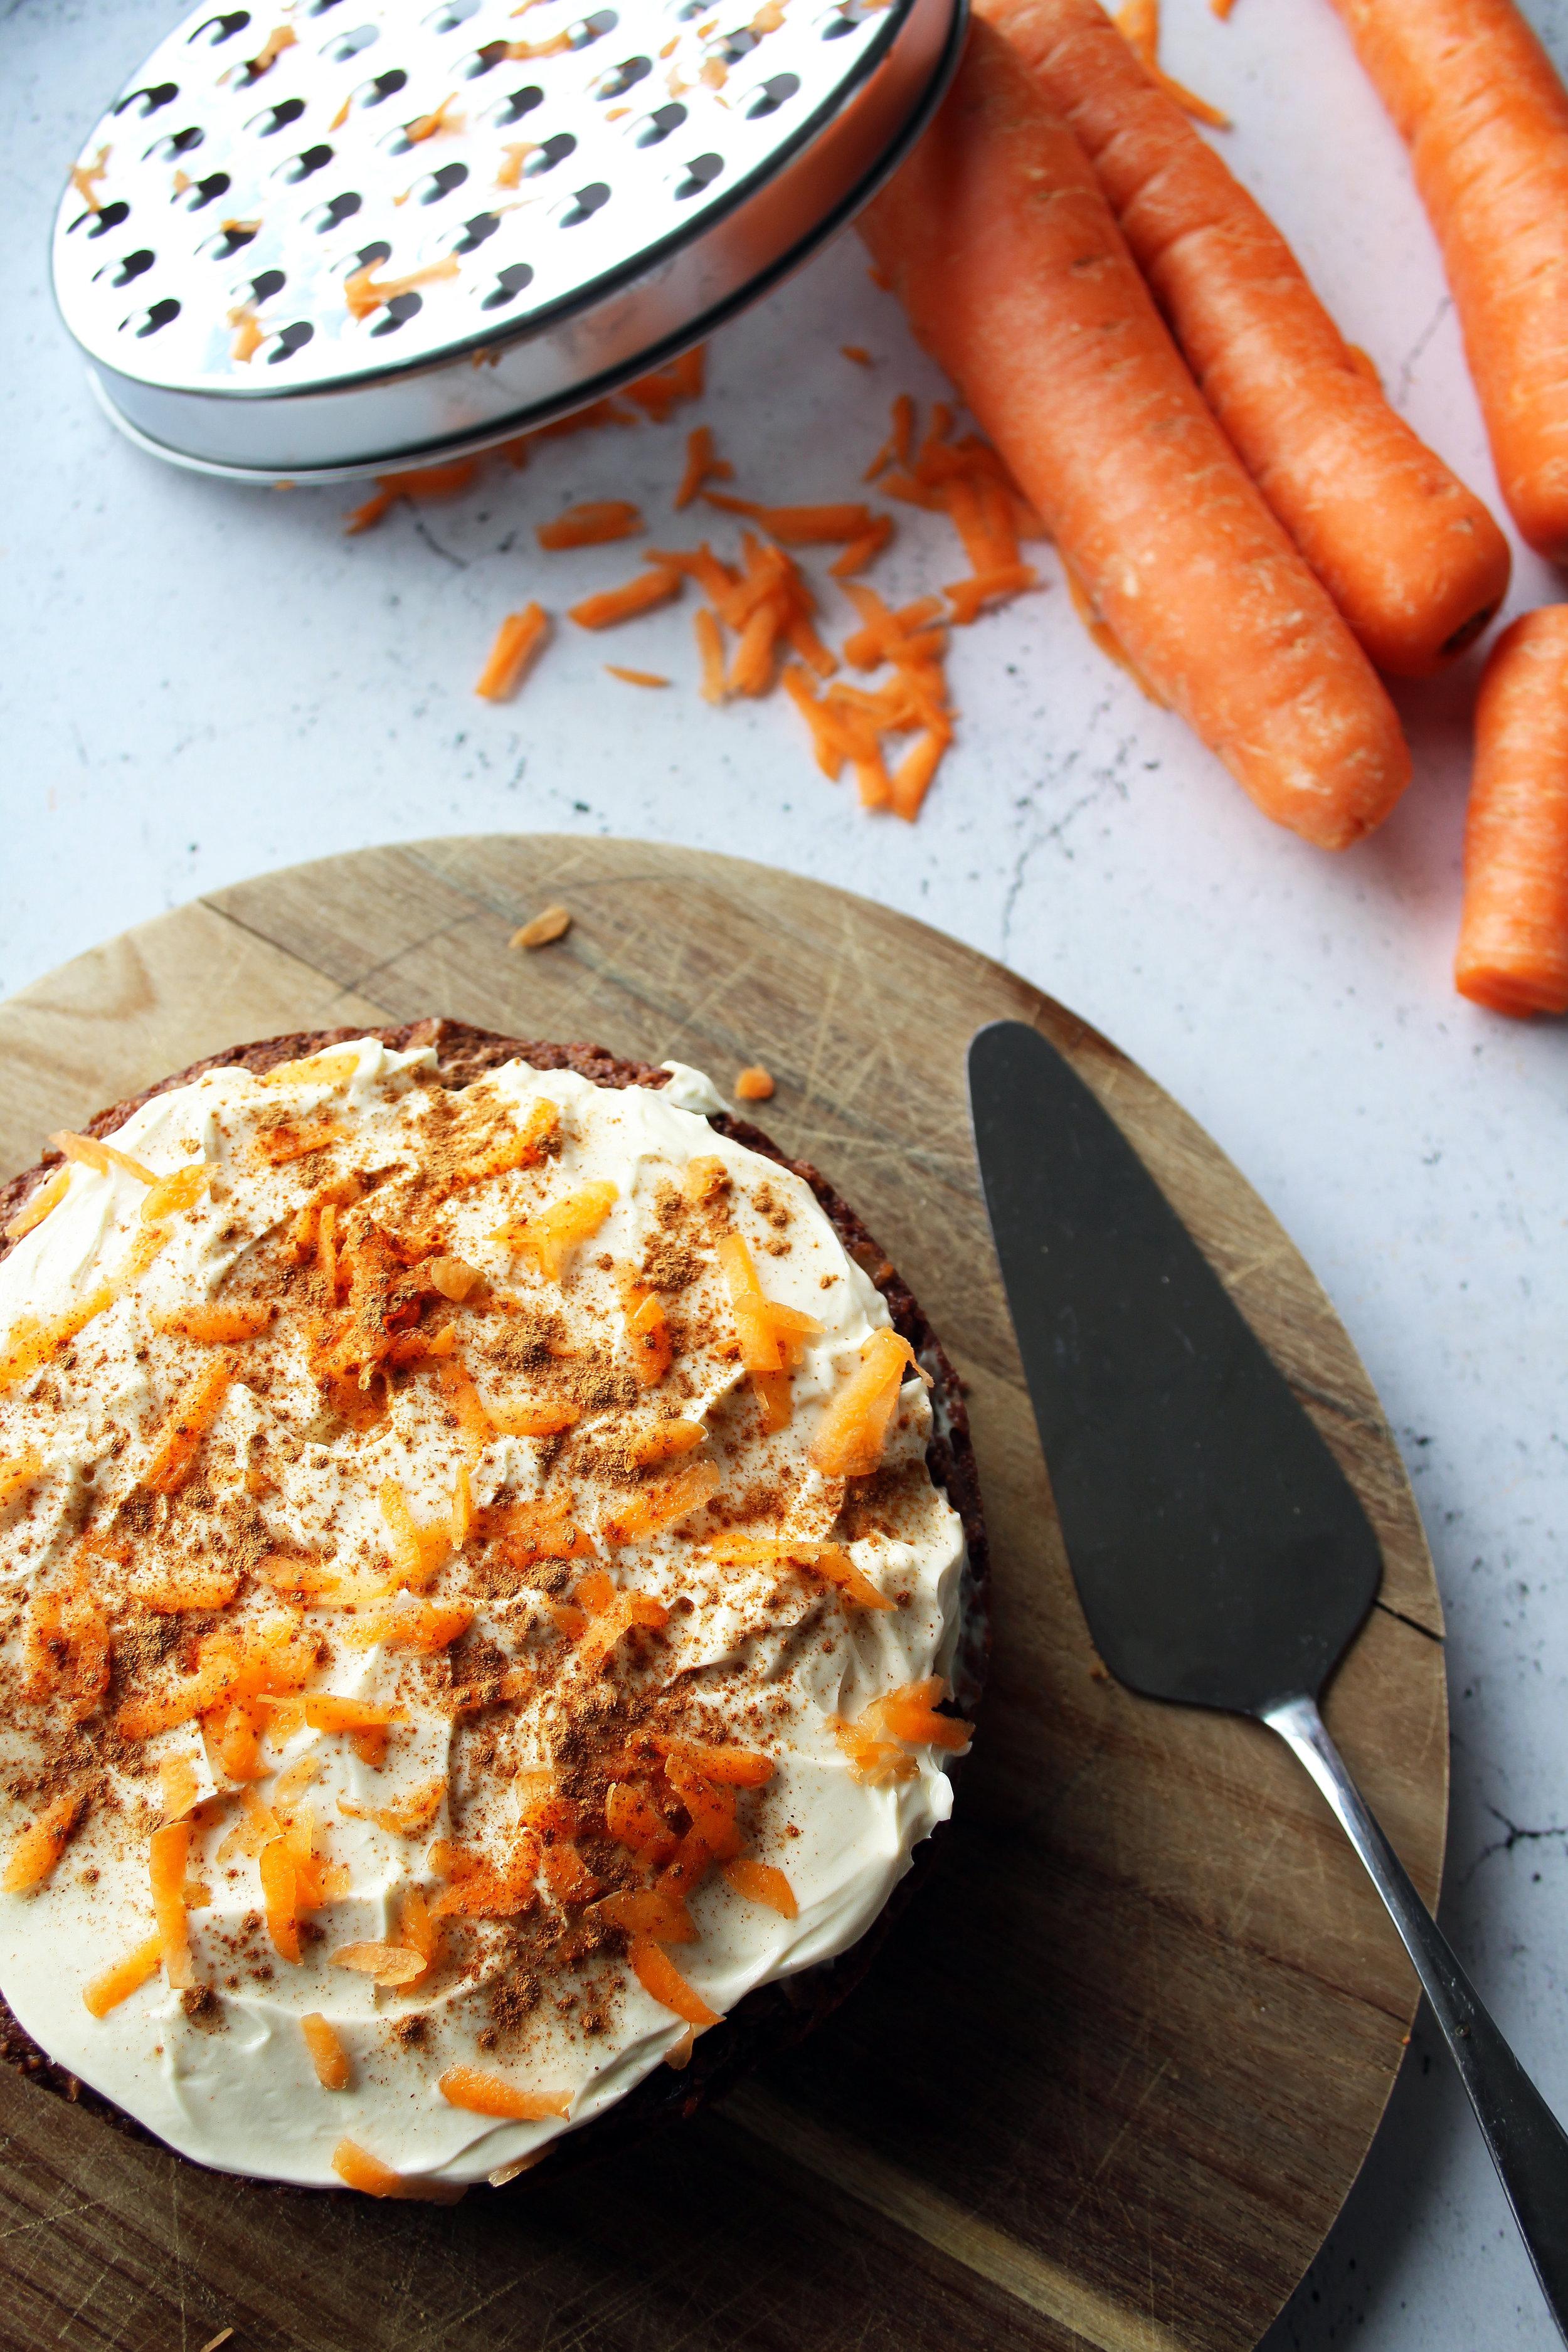 Healthy carrot cake recipe | The Flourishing Pantry